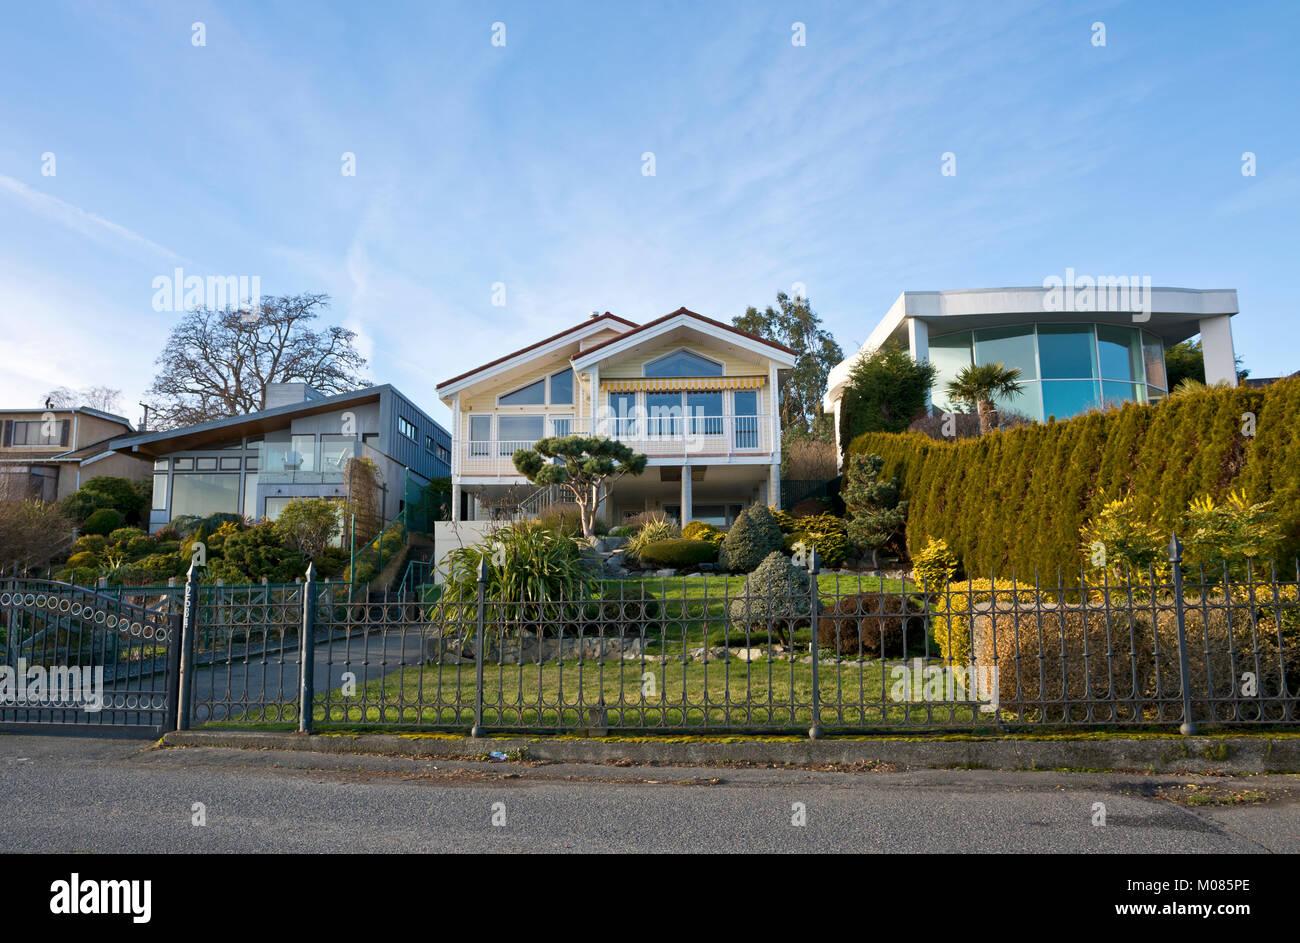 Luxury Homes Overlooking The Ocean In Greater Victoria, British Columbia,  Canada. Houses On Esplanade In Oak Bay.